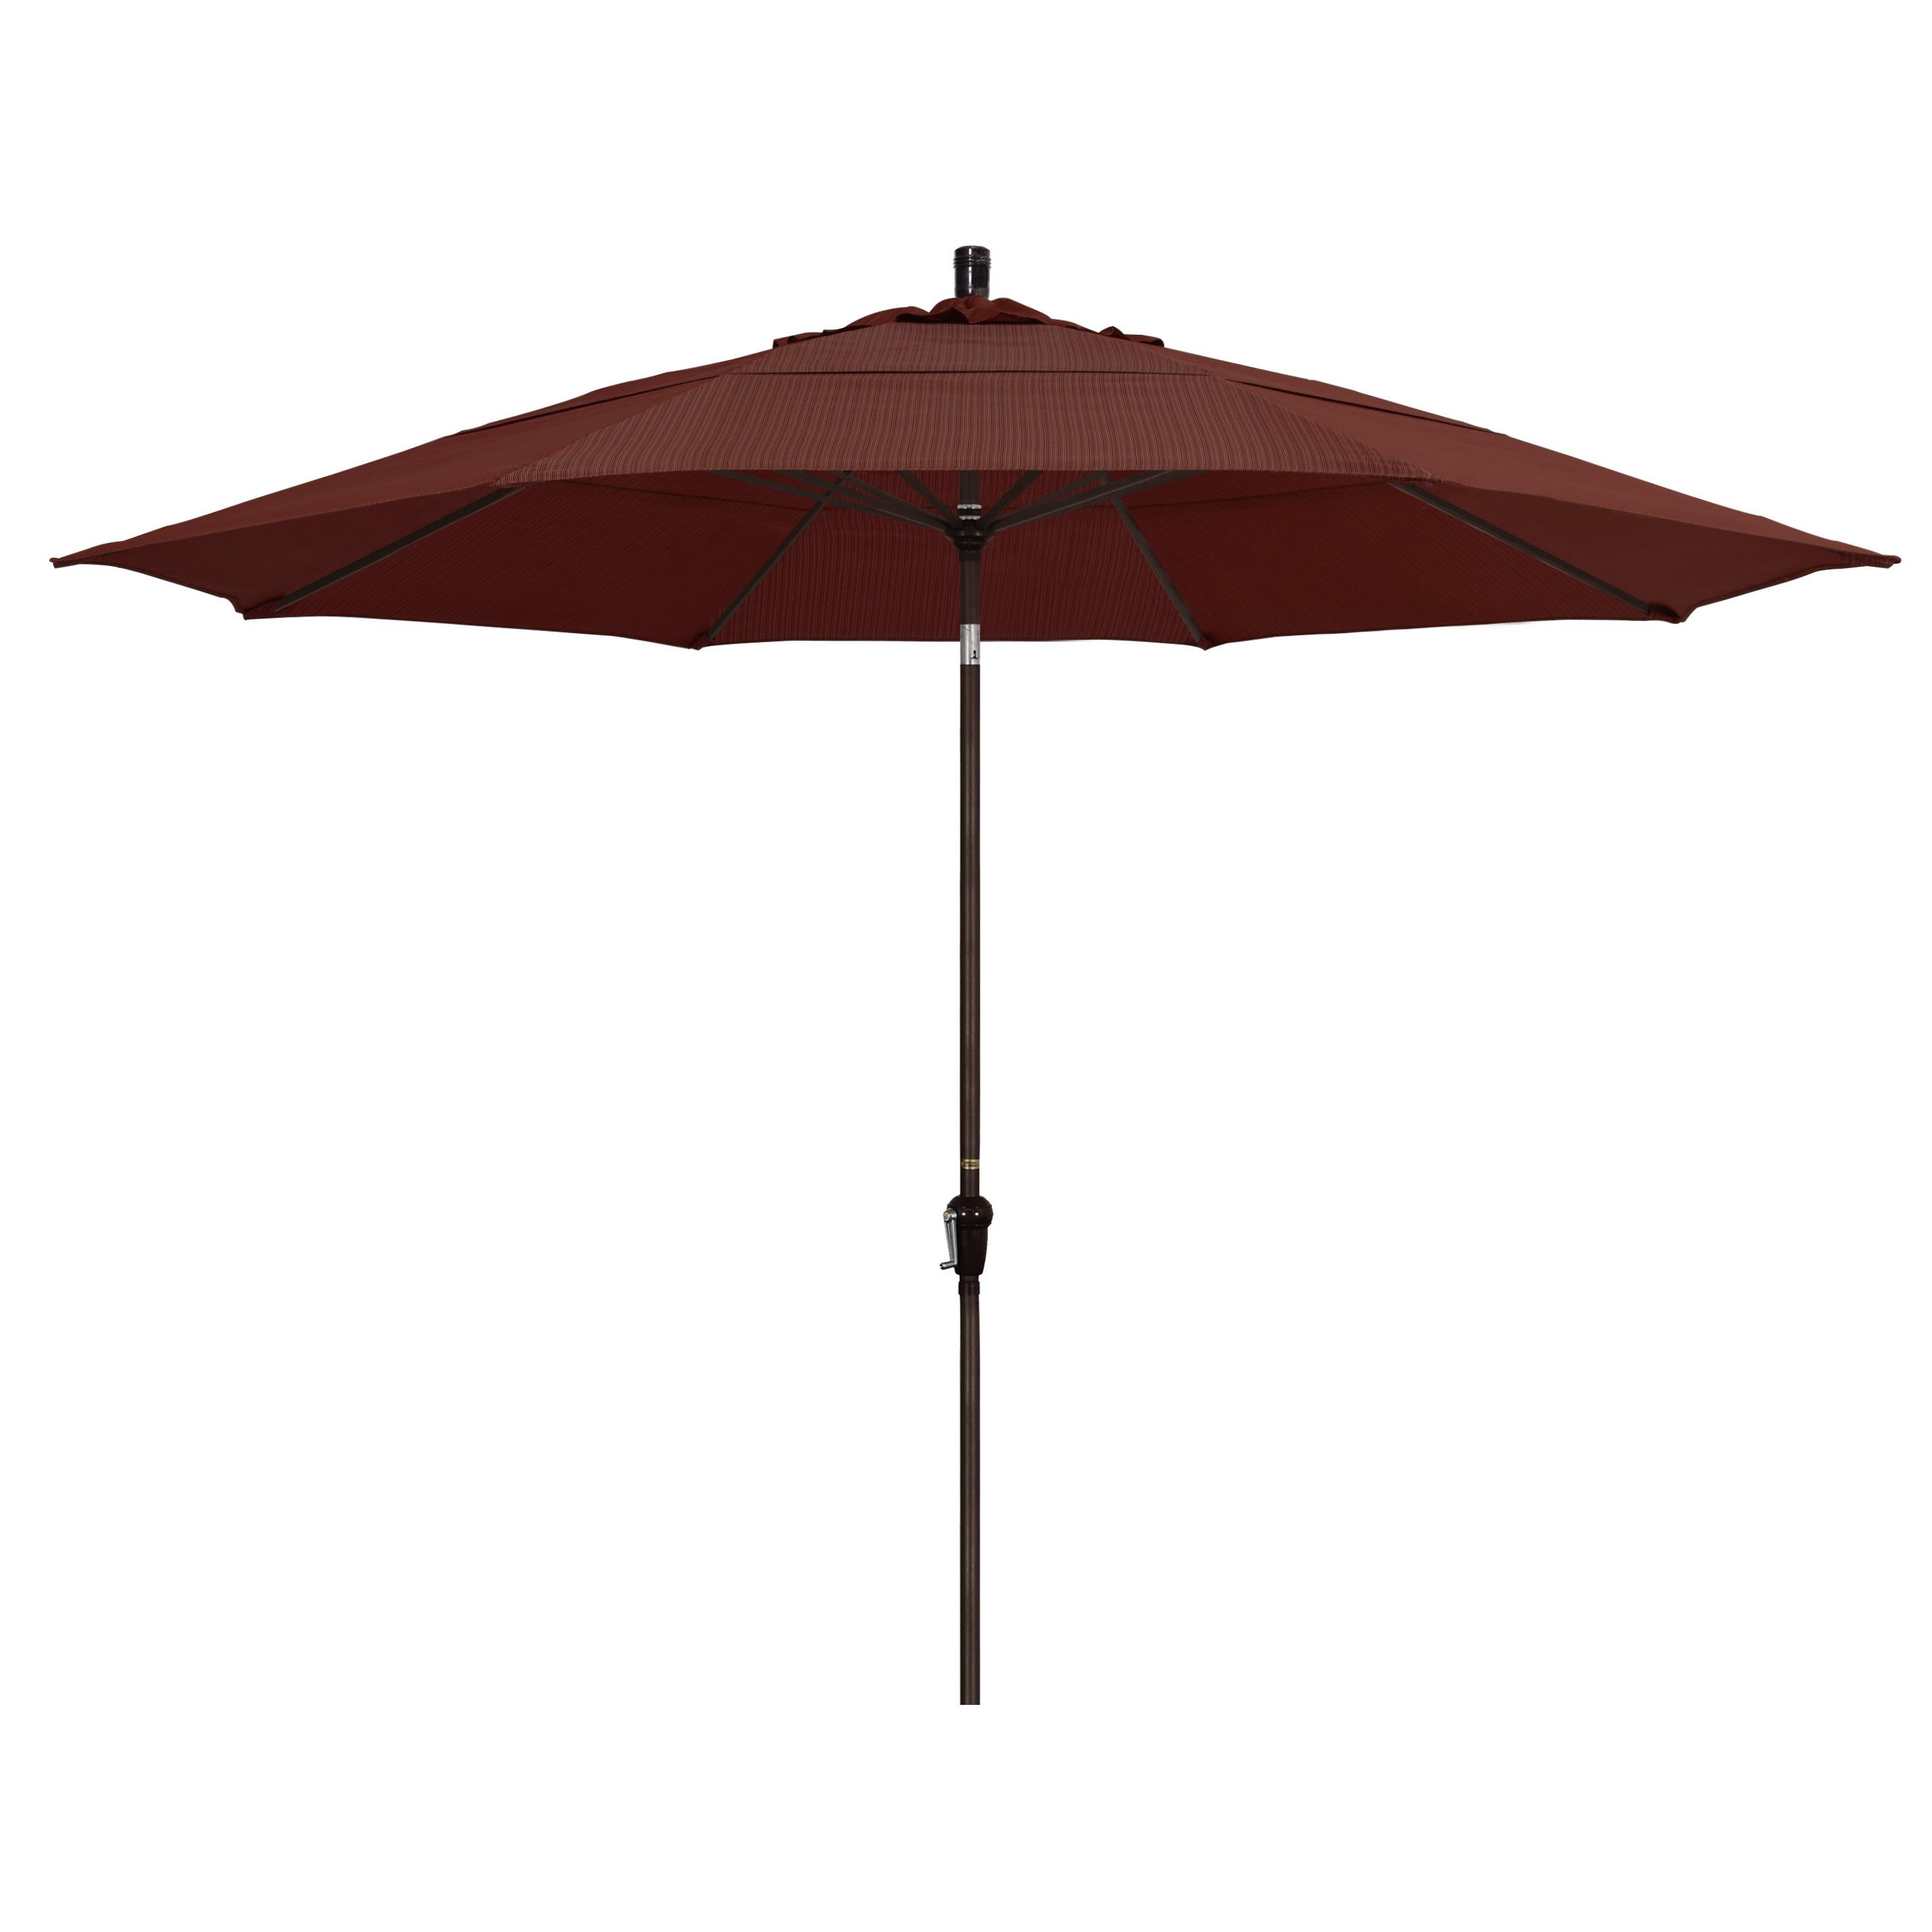 Mullaney Beachcrest Home Market Umbrellas In 2020 Mullaney 11' Market Umbrella (Gallery 3 of 20)